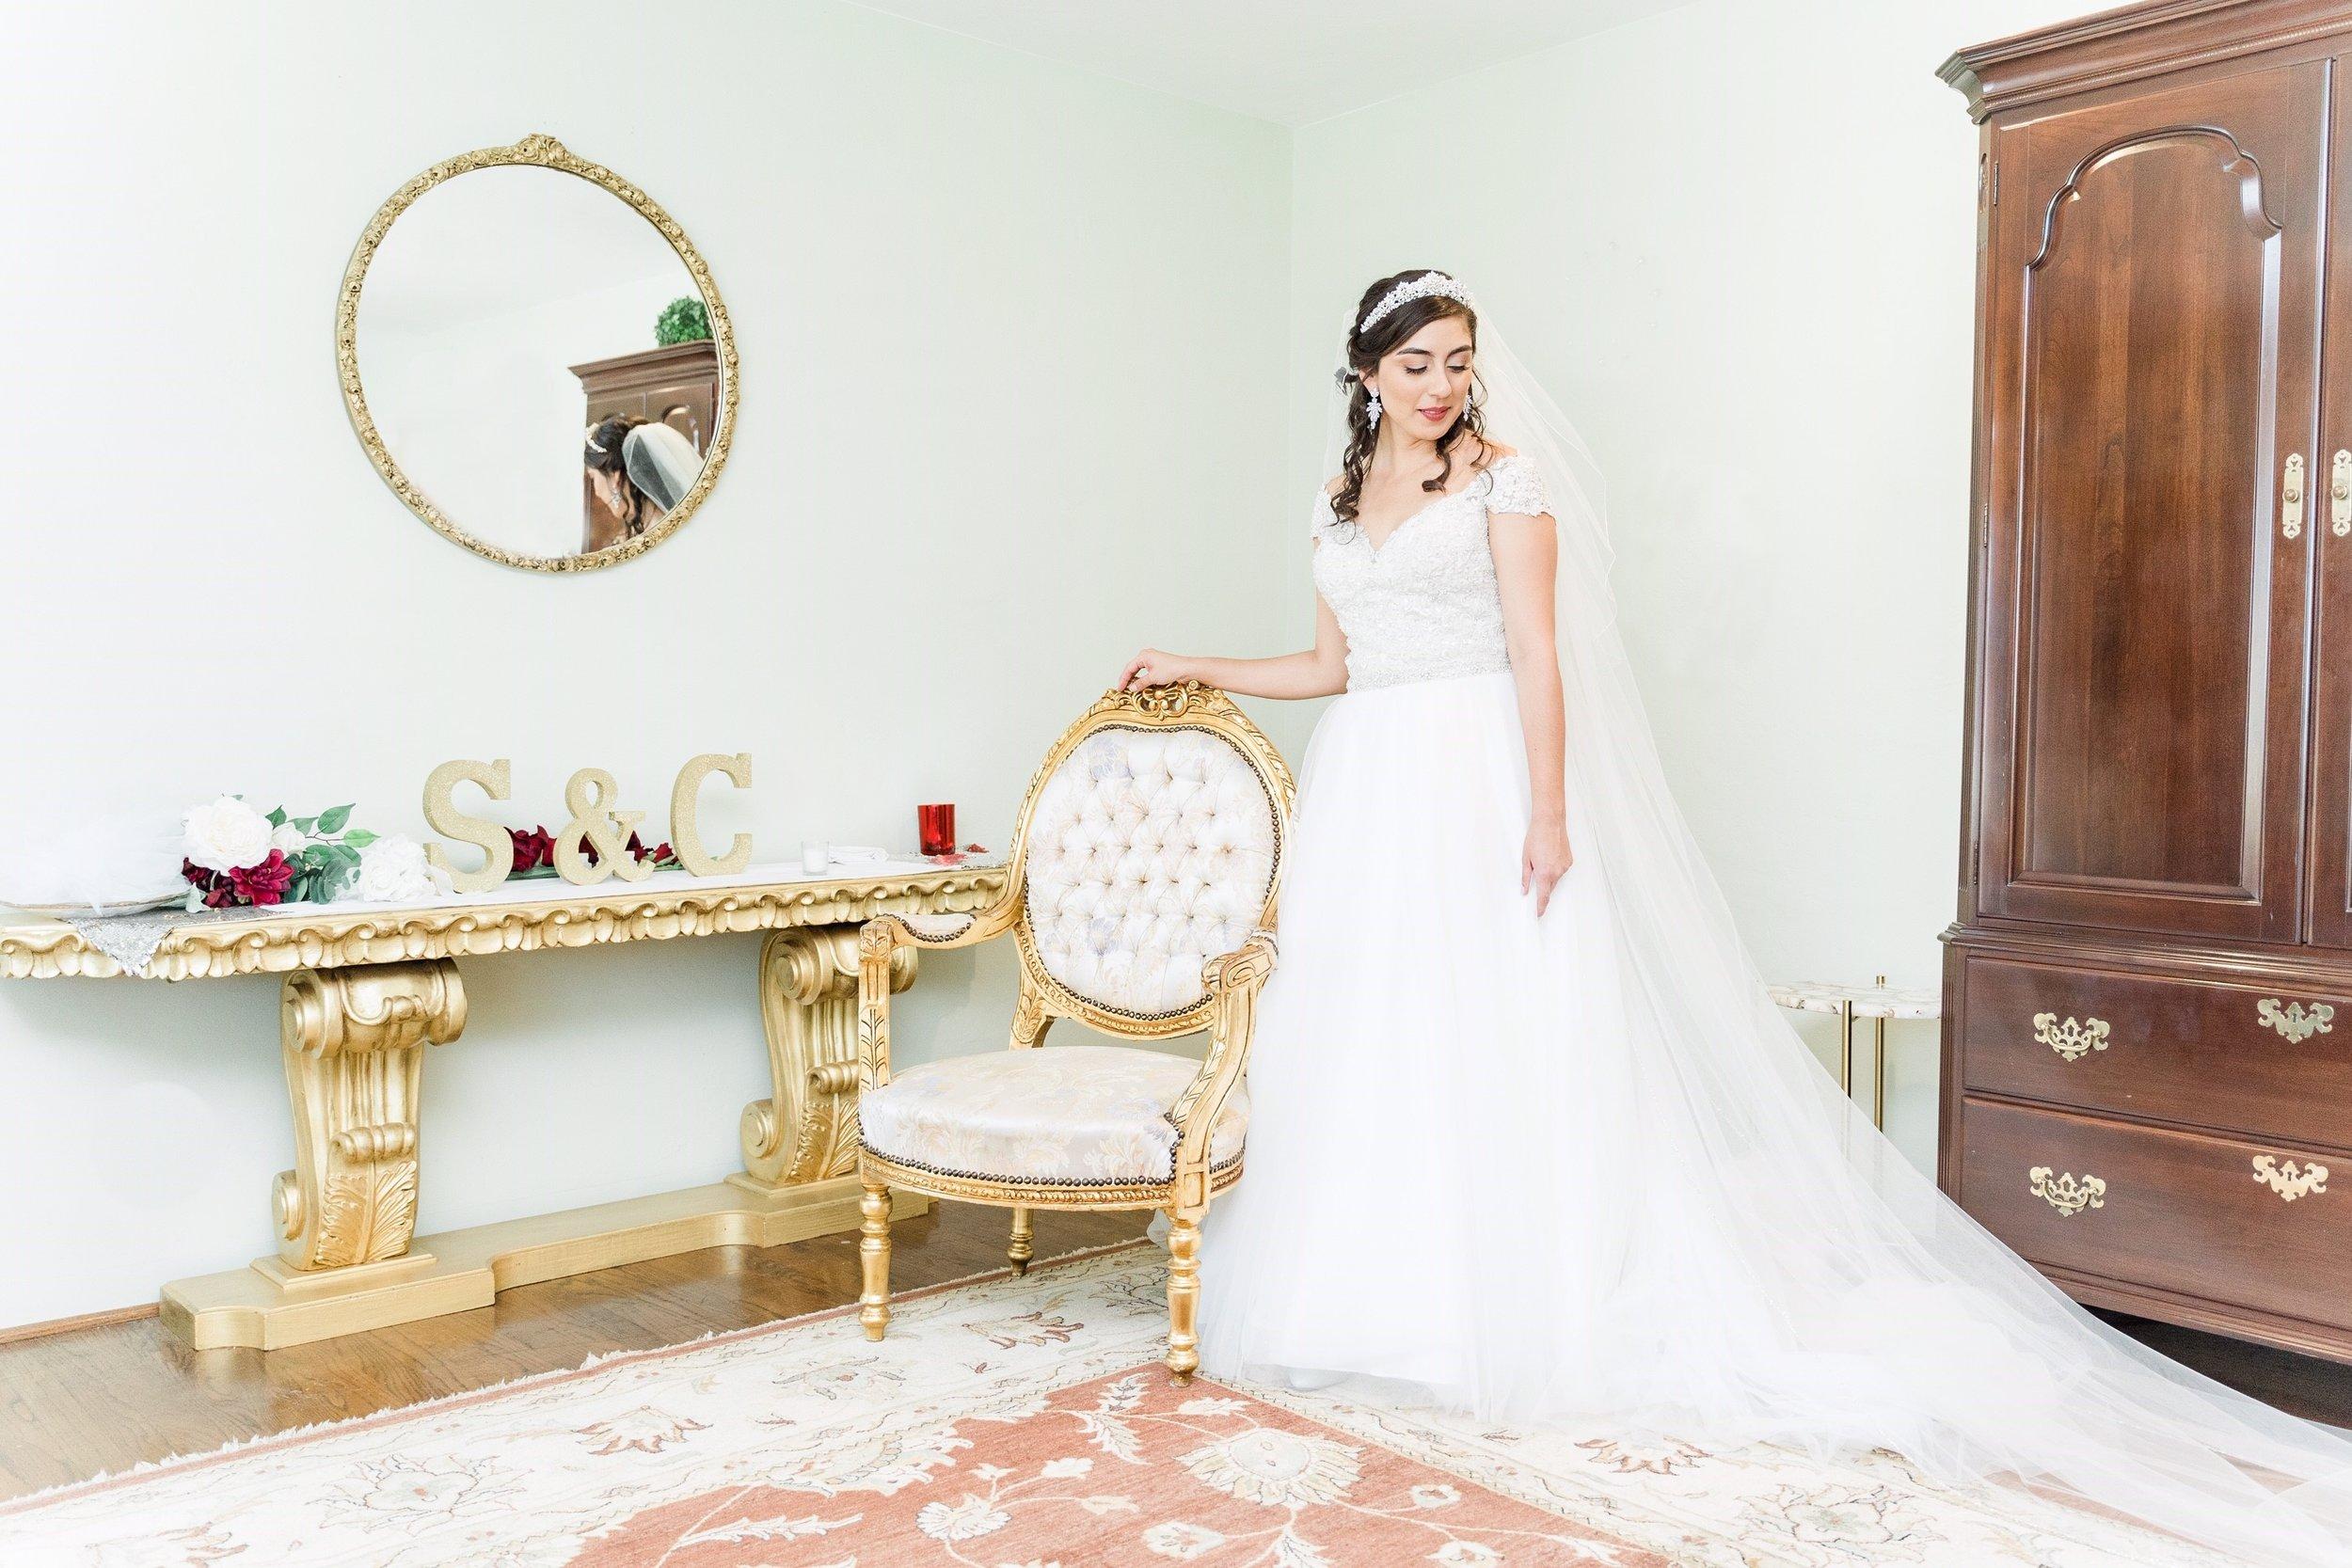 monterey-wedding-photographer-caitlin-steven-drew-zavala-1.jpg